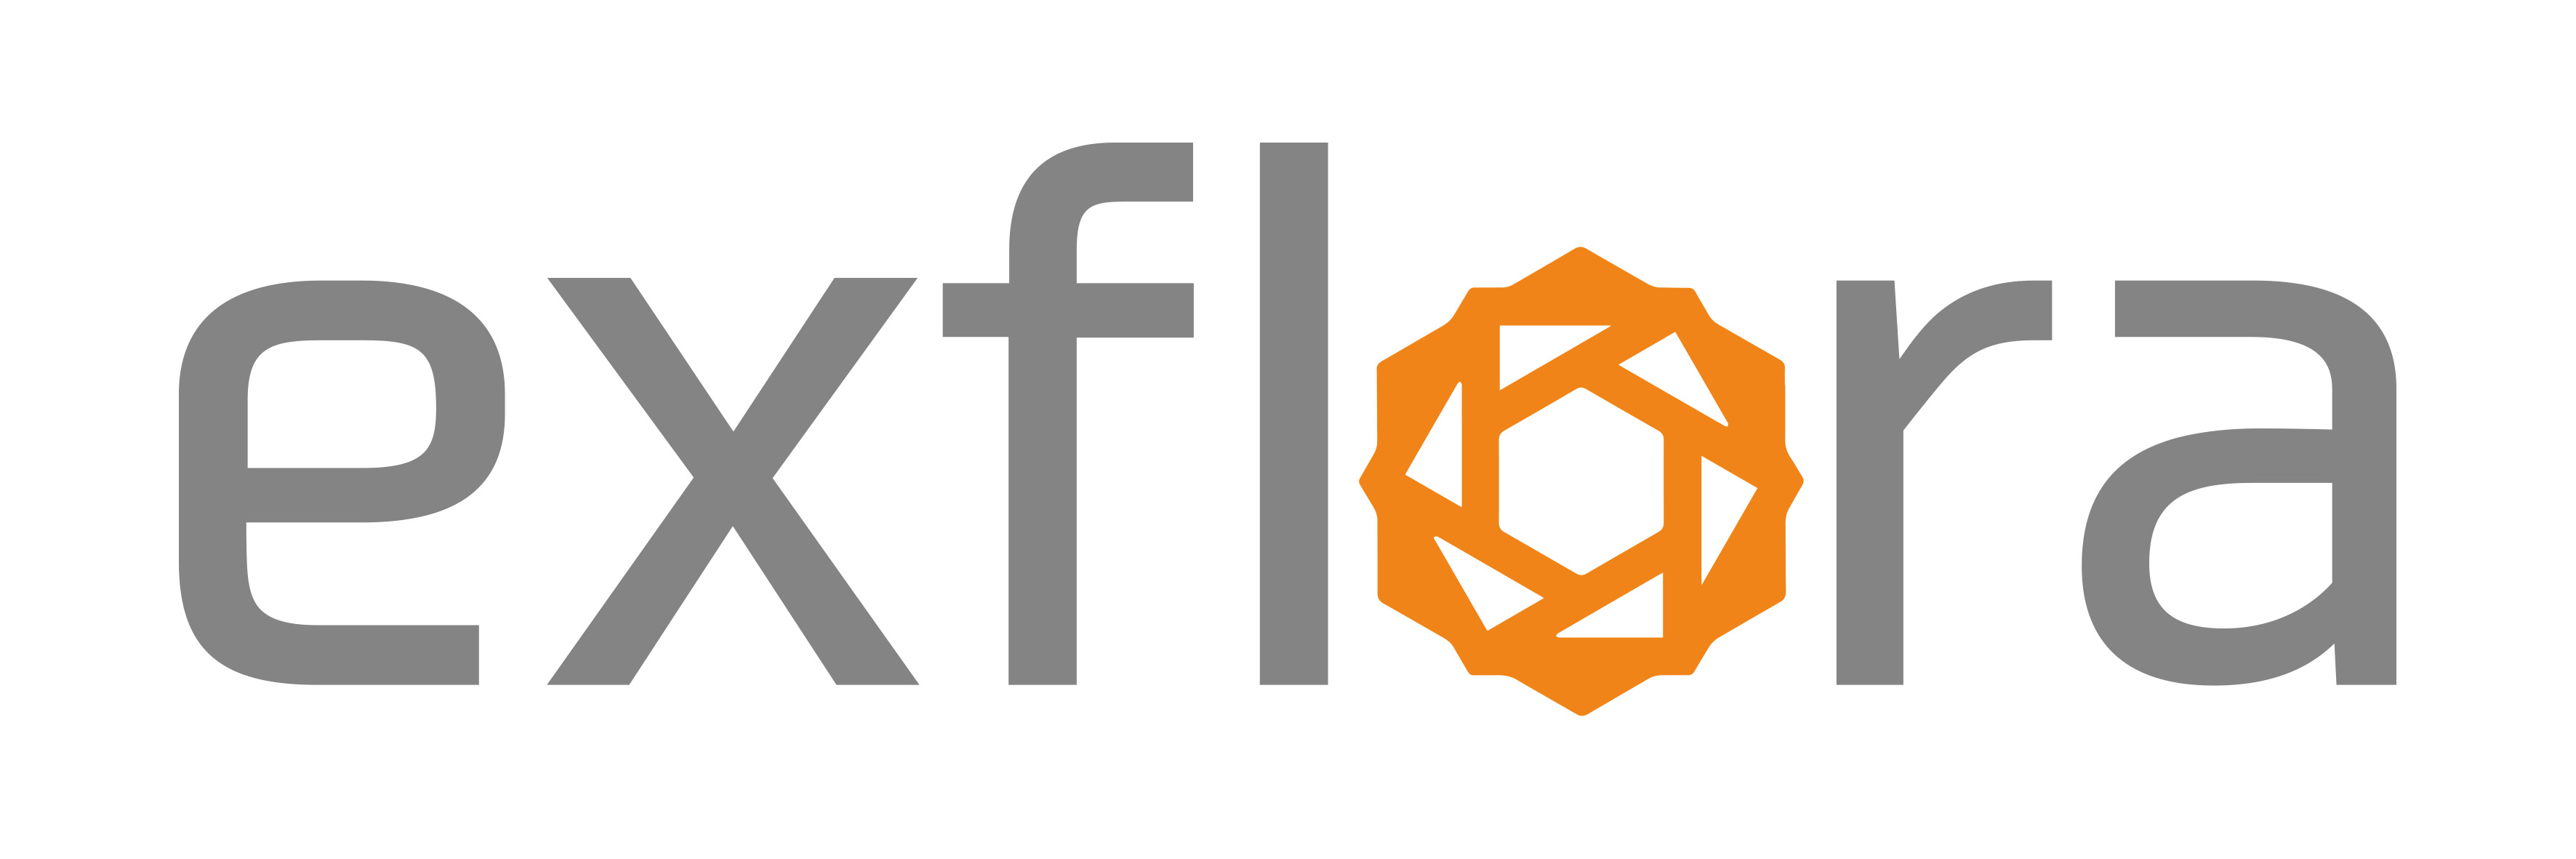 株式会社exflora